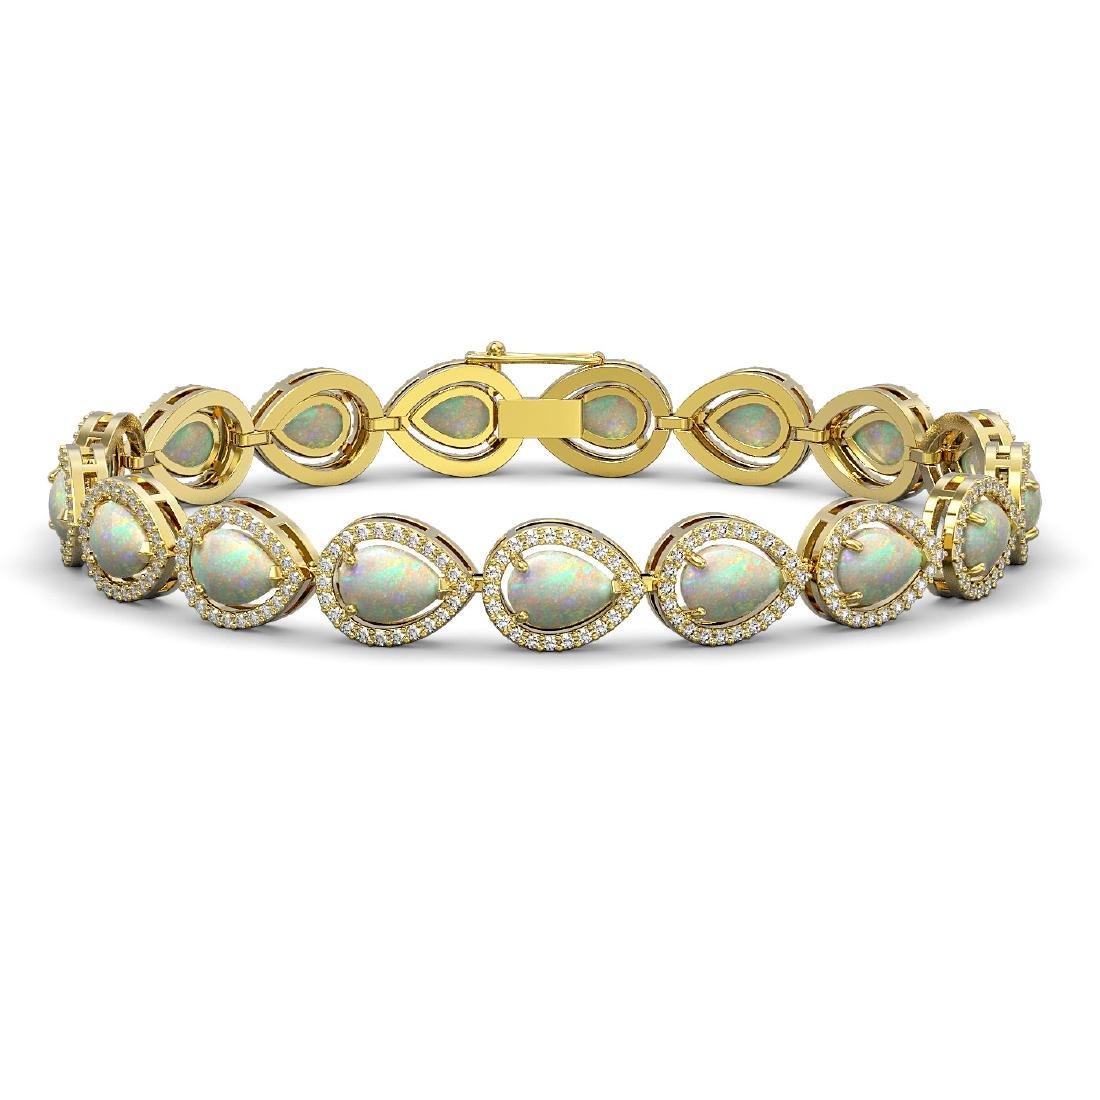 13.19 CTW Opal & Diamond Halo Bracelet 10K Yellow Gold